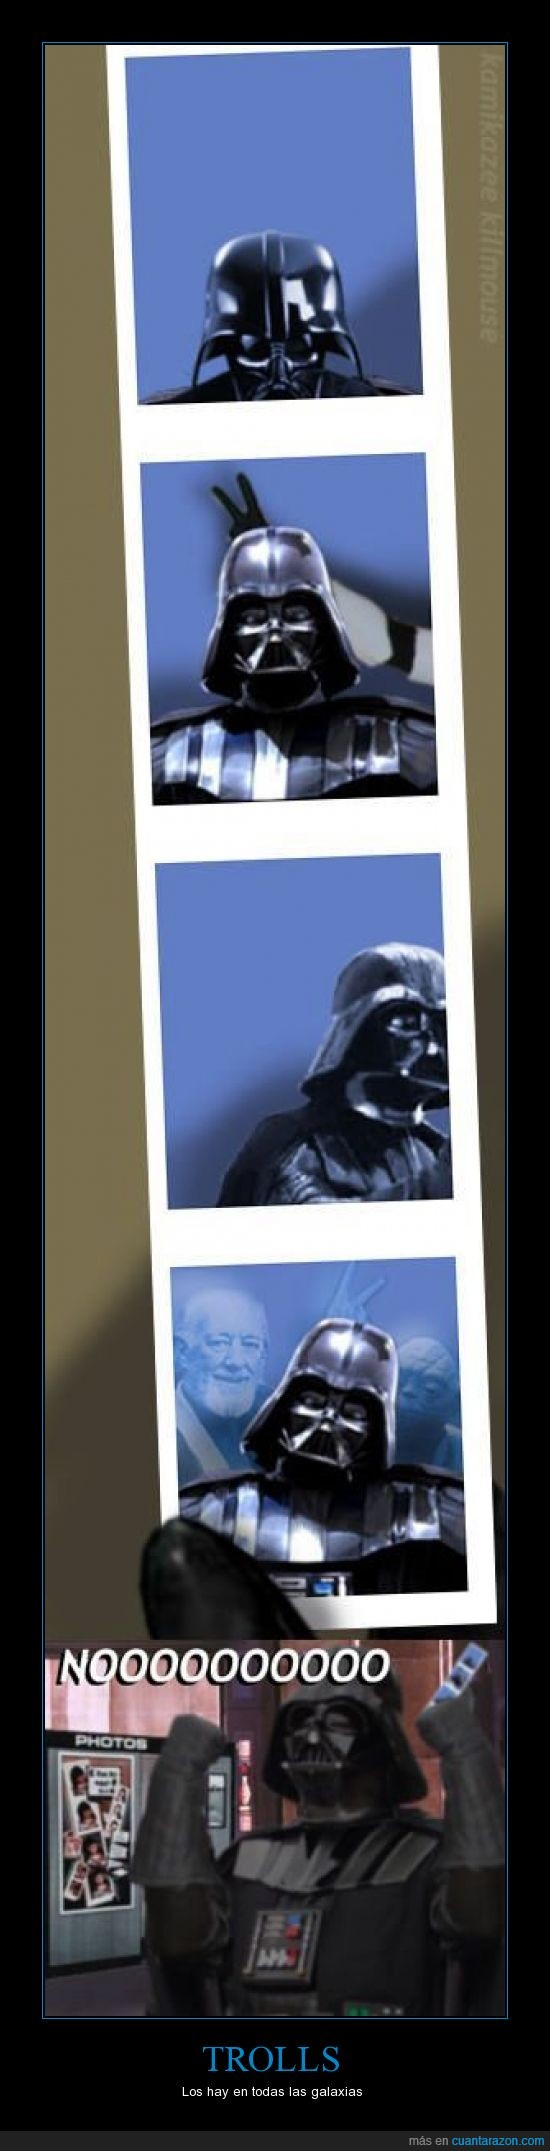 Darth Vader,galaxia,Obi Wan,Star Wars,stormtrooper,troll,Yoda